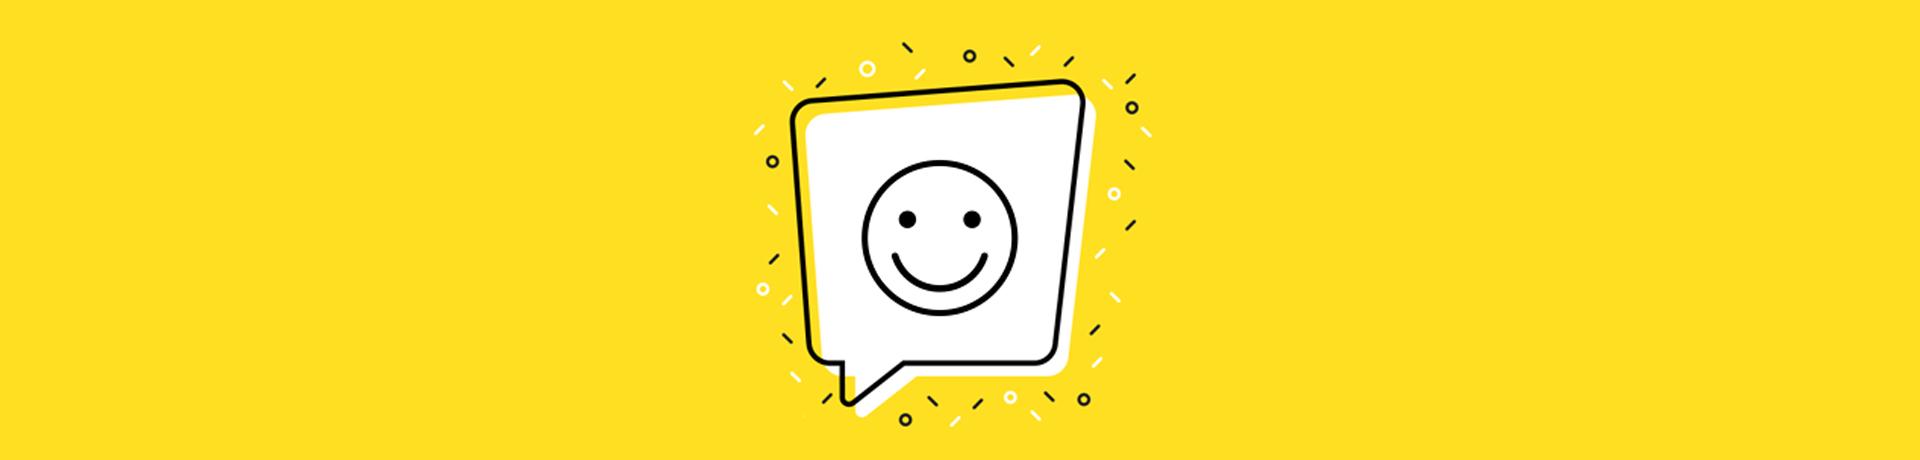 Satisfied customer feedback - please submit here